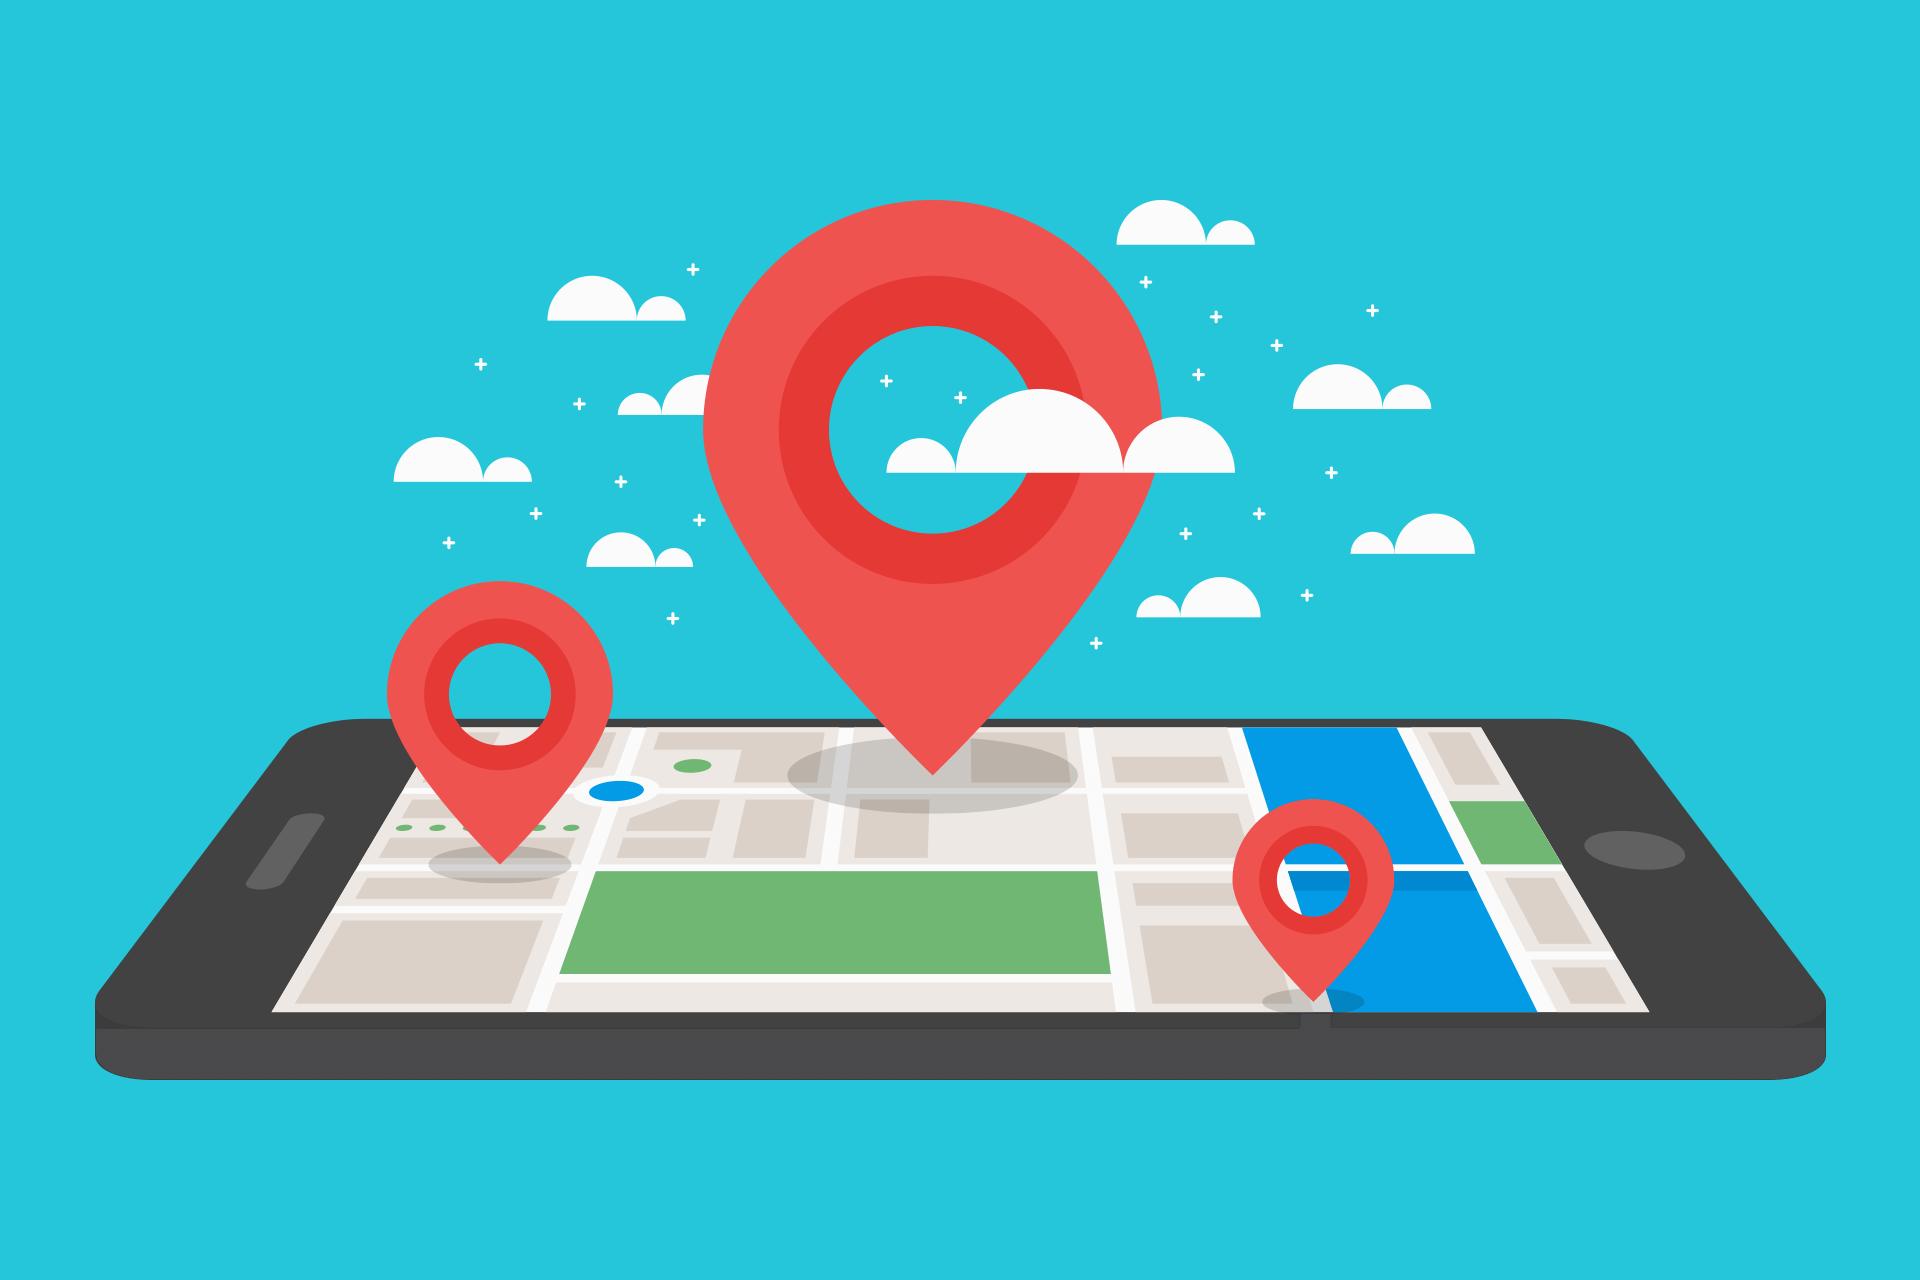 Zo kun je jouw bedrijf toevoegen op Google Maps